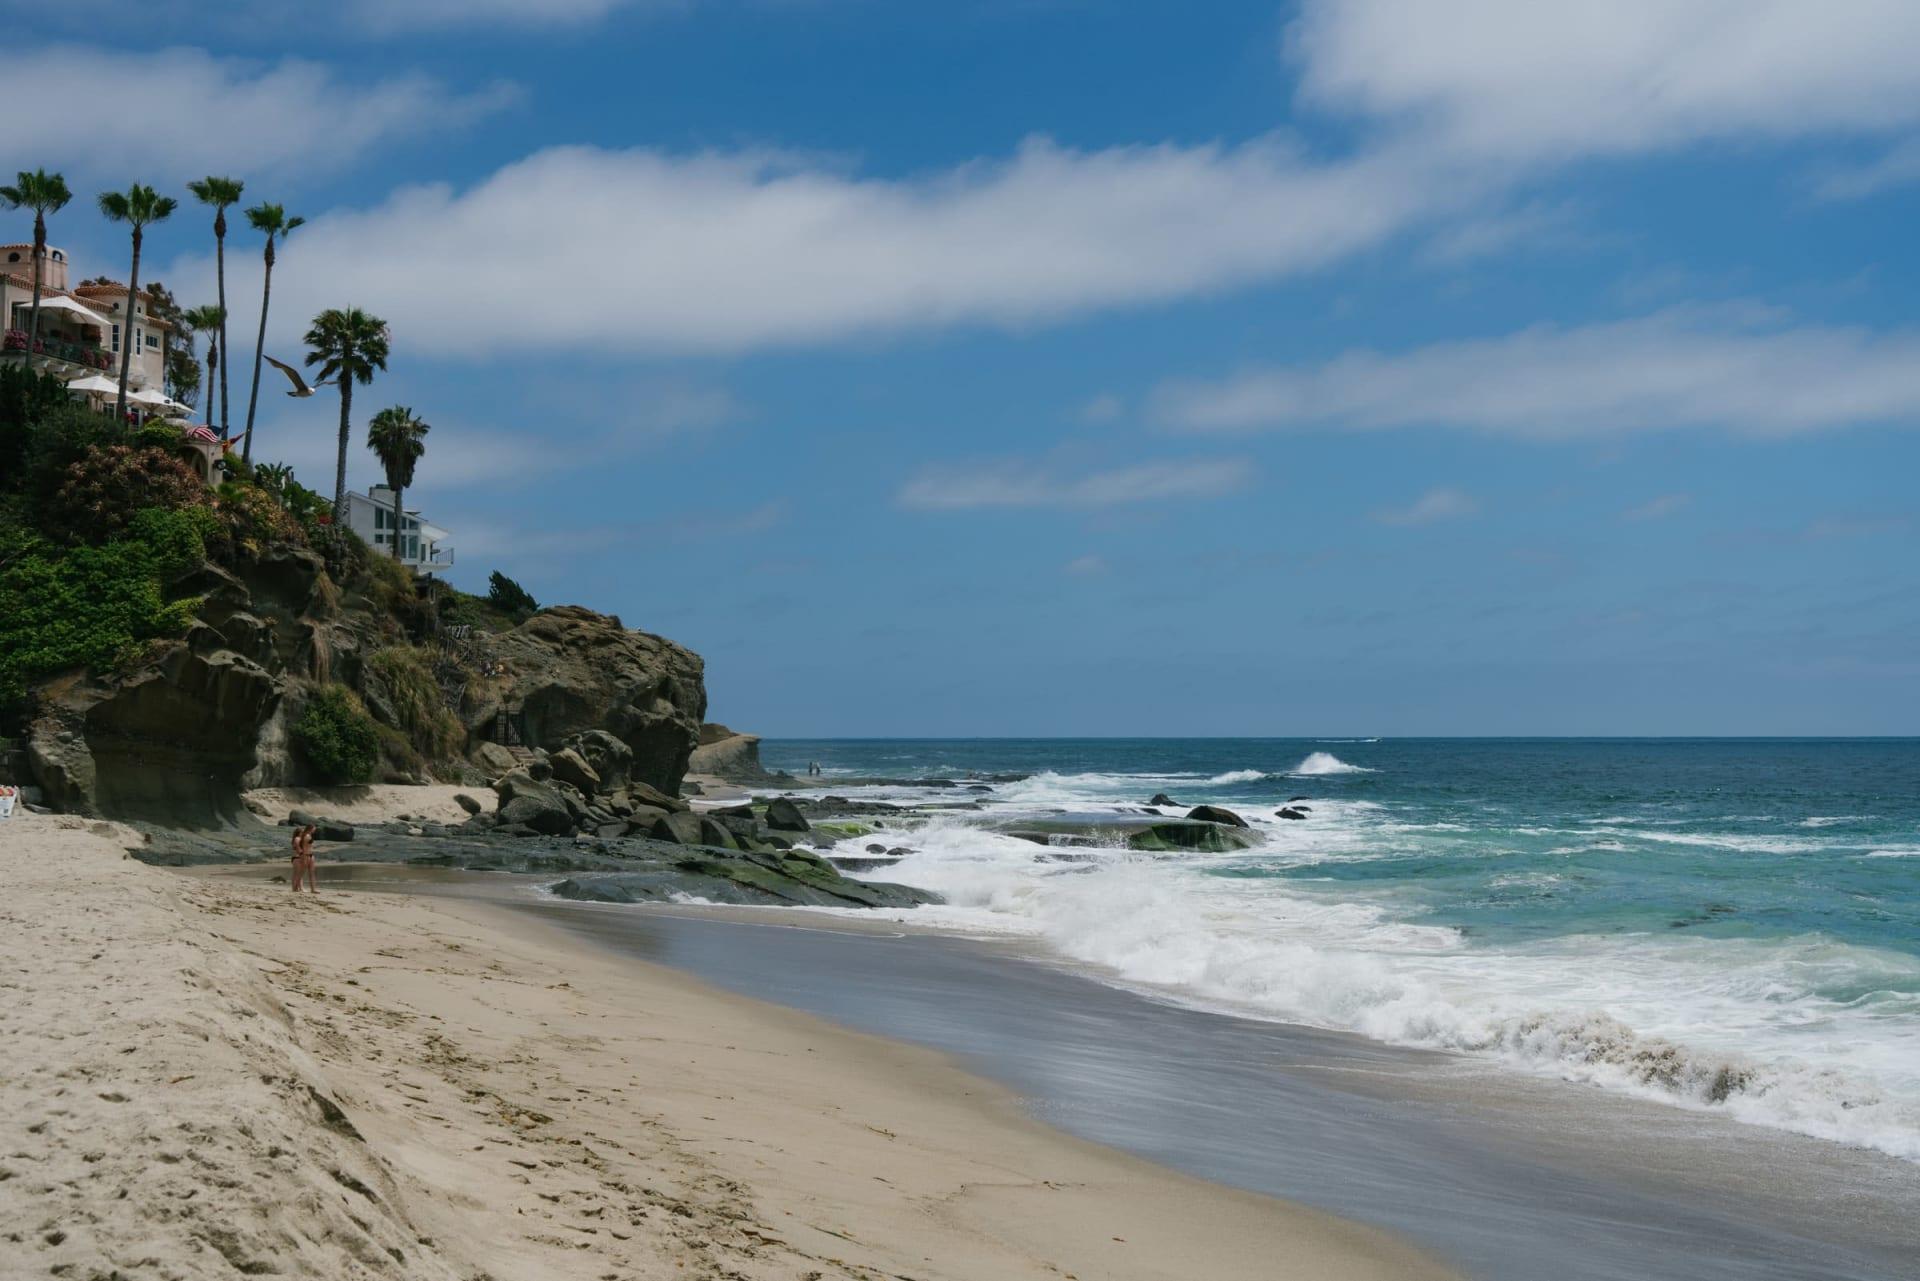 THE 3 BEST BEACHES IN ORANGE COUNTY